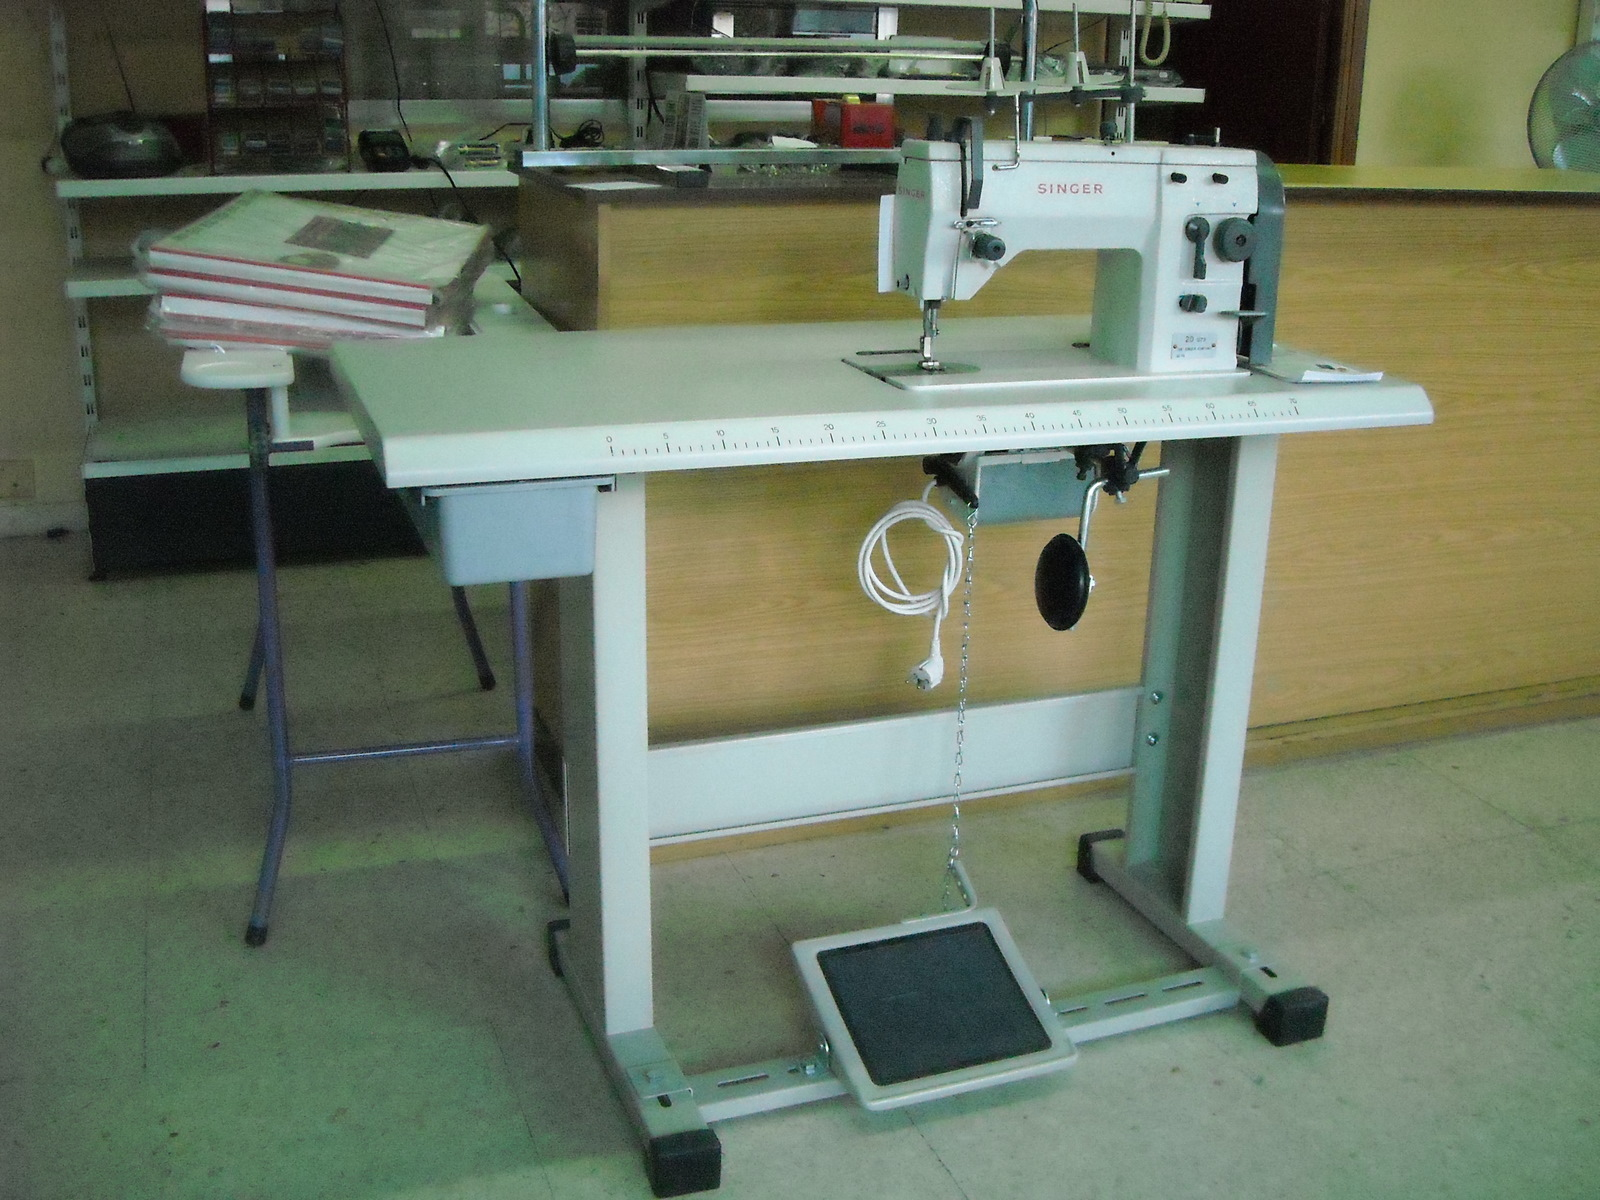 Maquina de coser buscar: Maquinas de coser semi industriales